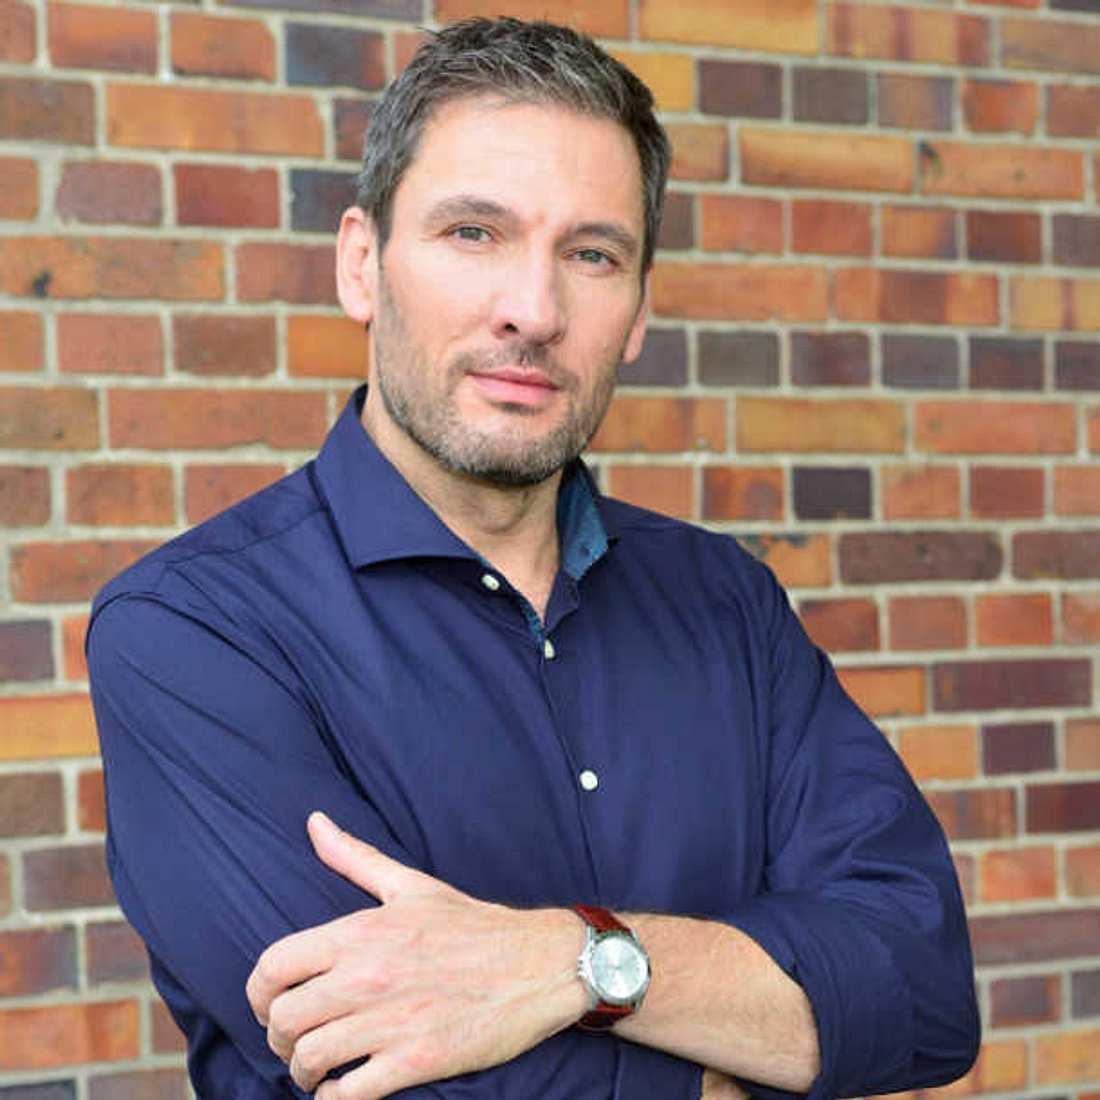 Dieter Bach kommt als Dr. Frederic Riefflin zu GZSZ